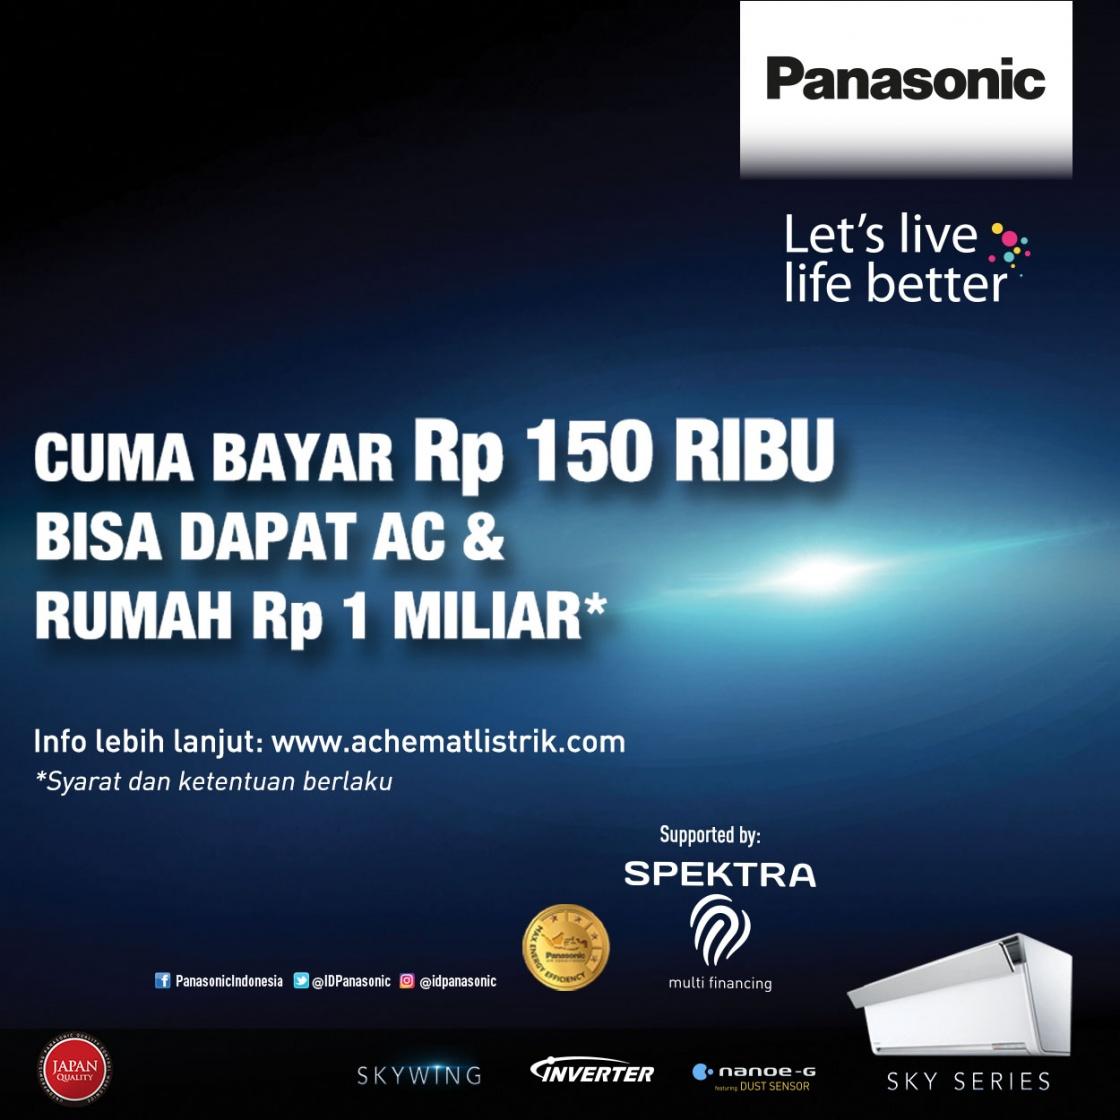 Cuma Bayar 150 Ribu Bisa Bawa AC Panasonic & Rumah 1 Miliar